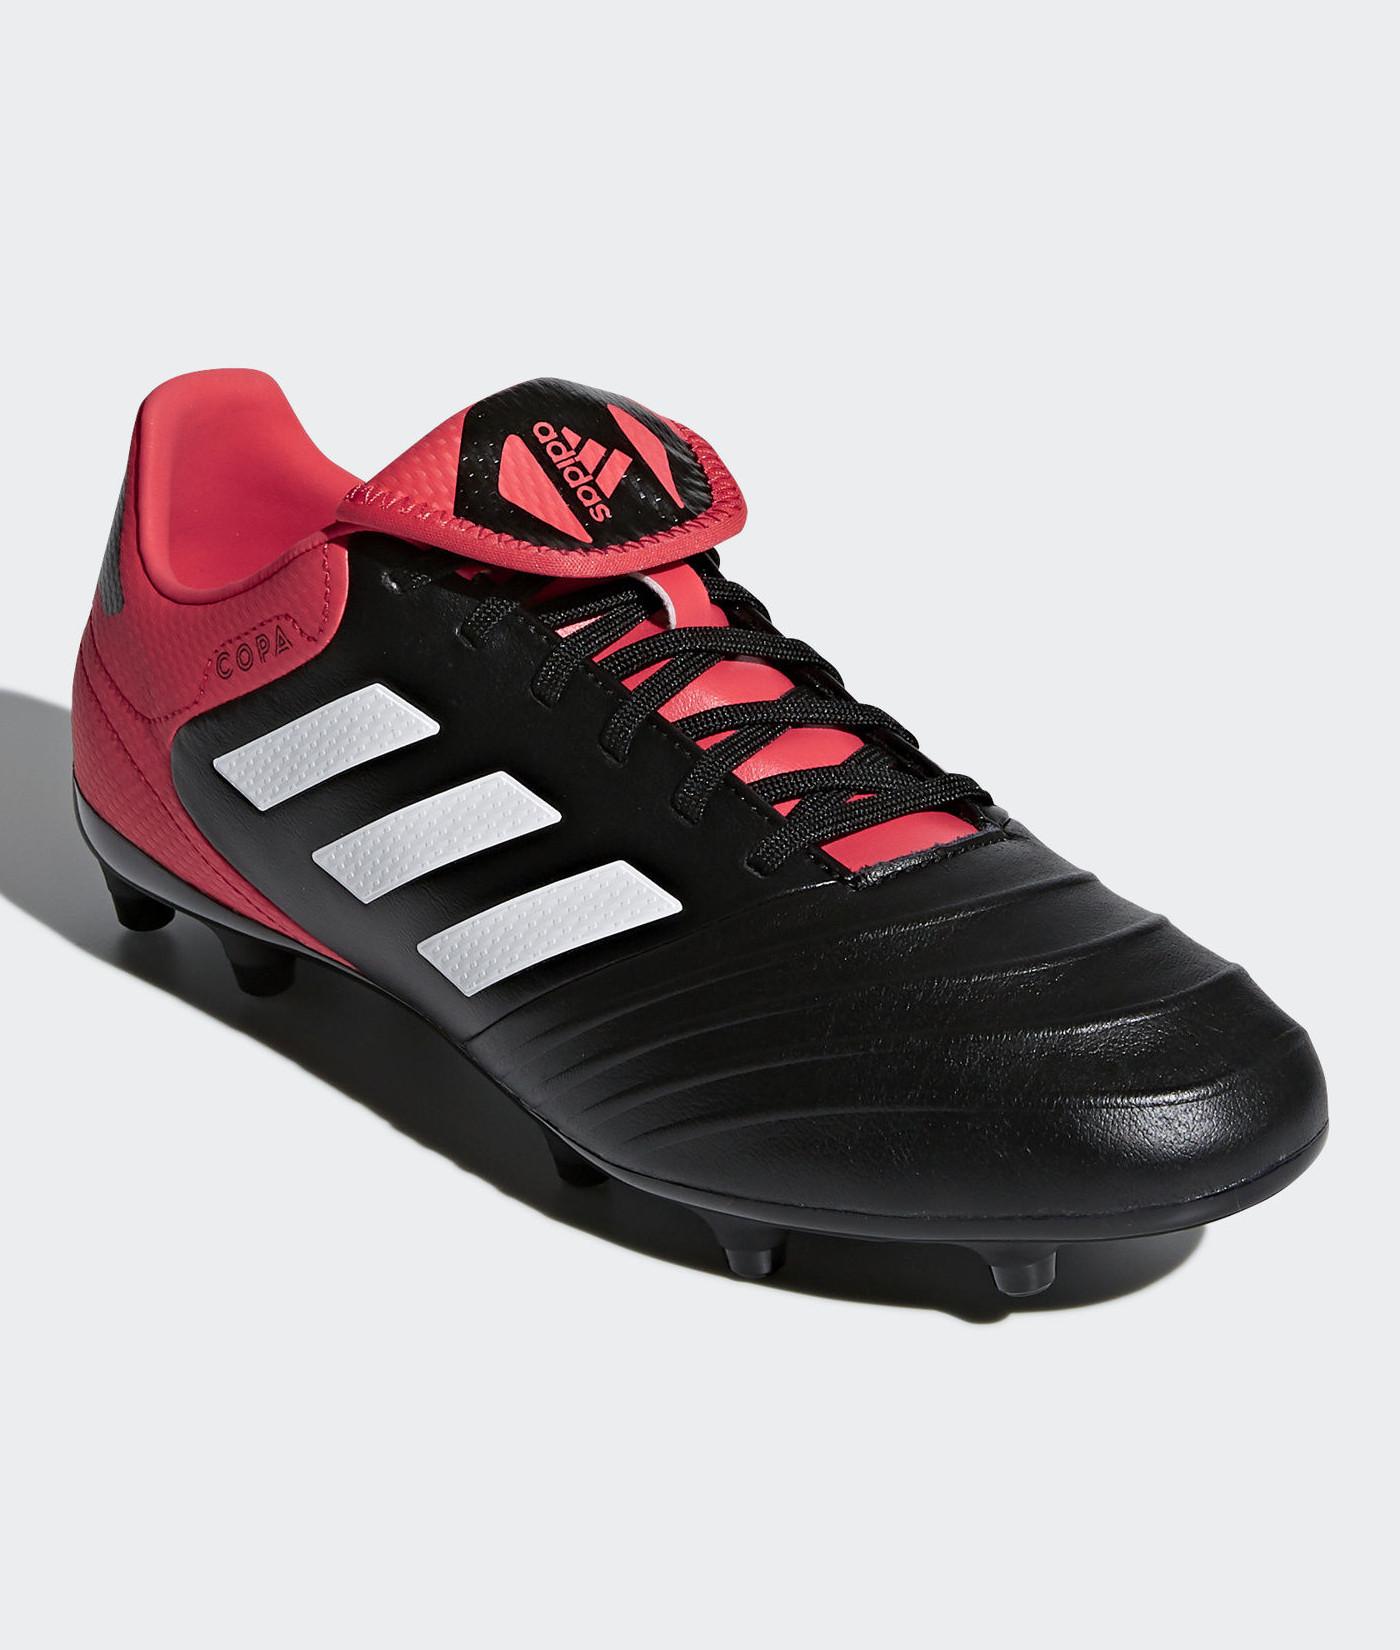 Adidas Scarpe Calcio Football Copa 18.3 FG Mundial Nero Vera Pelle 5ecd34d1eb6